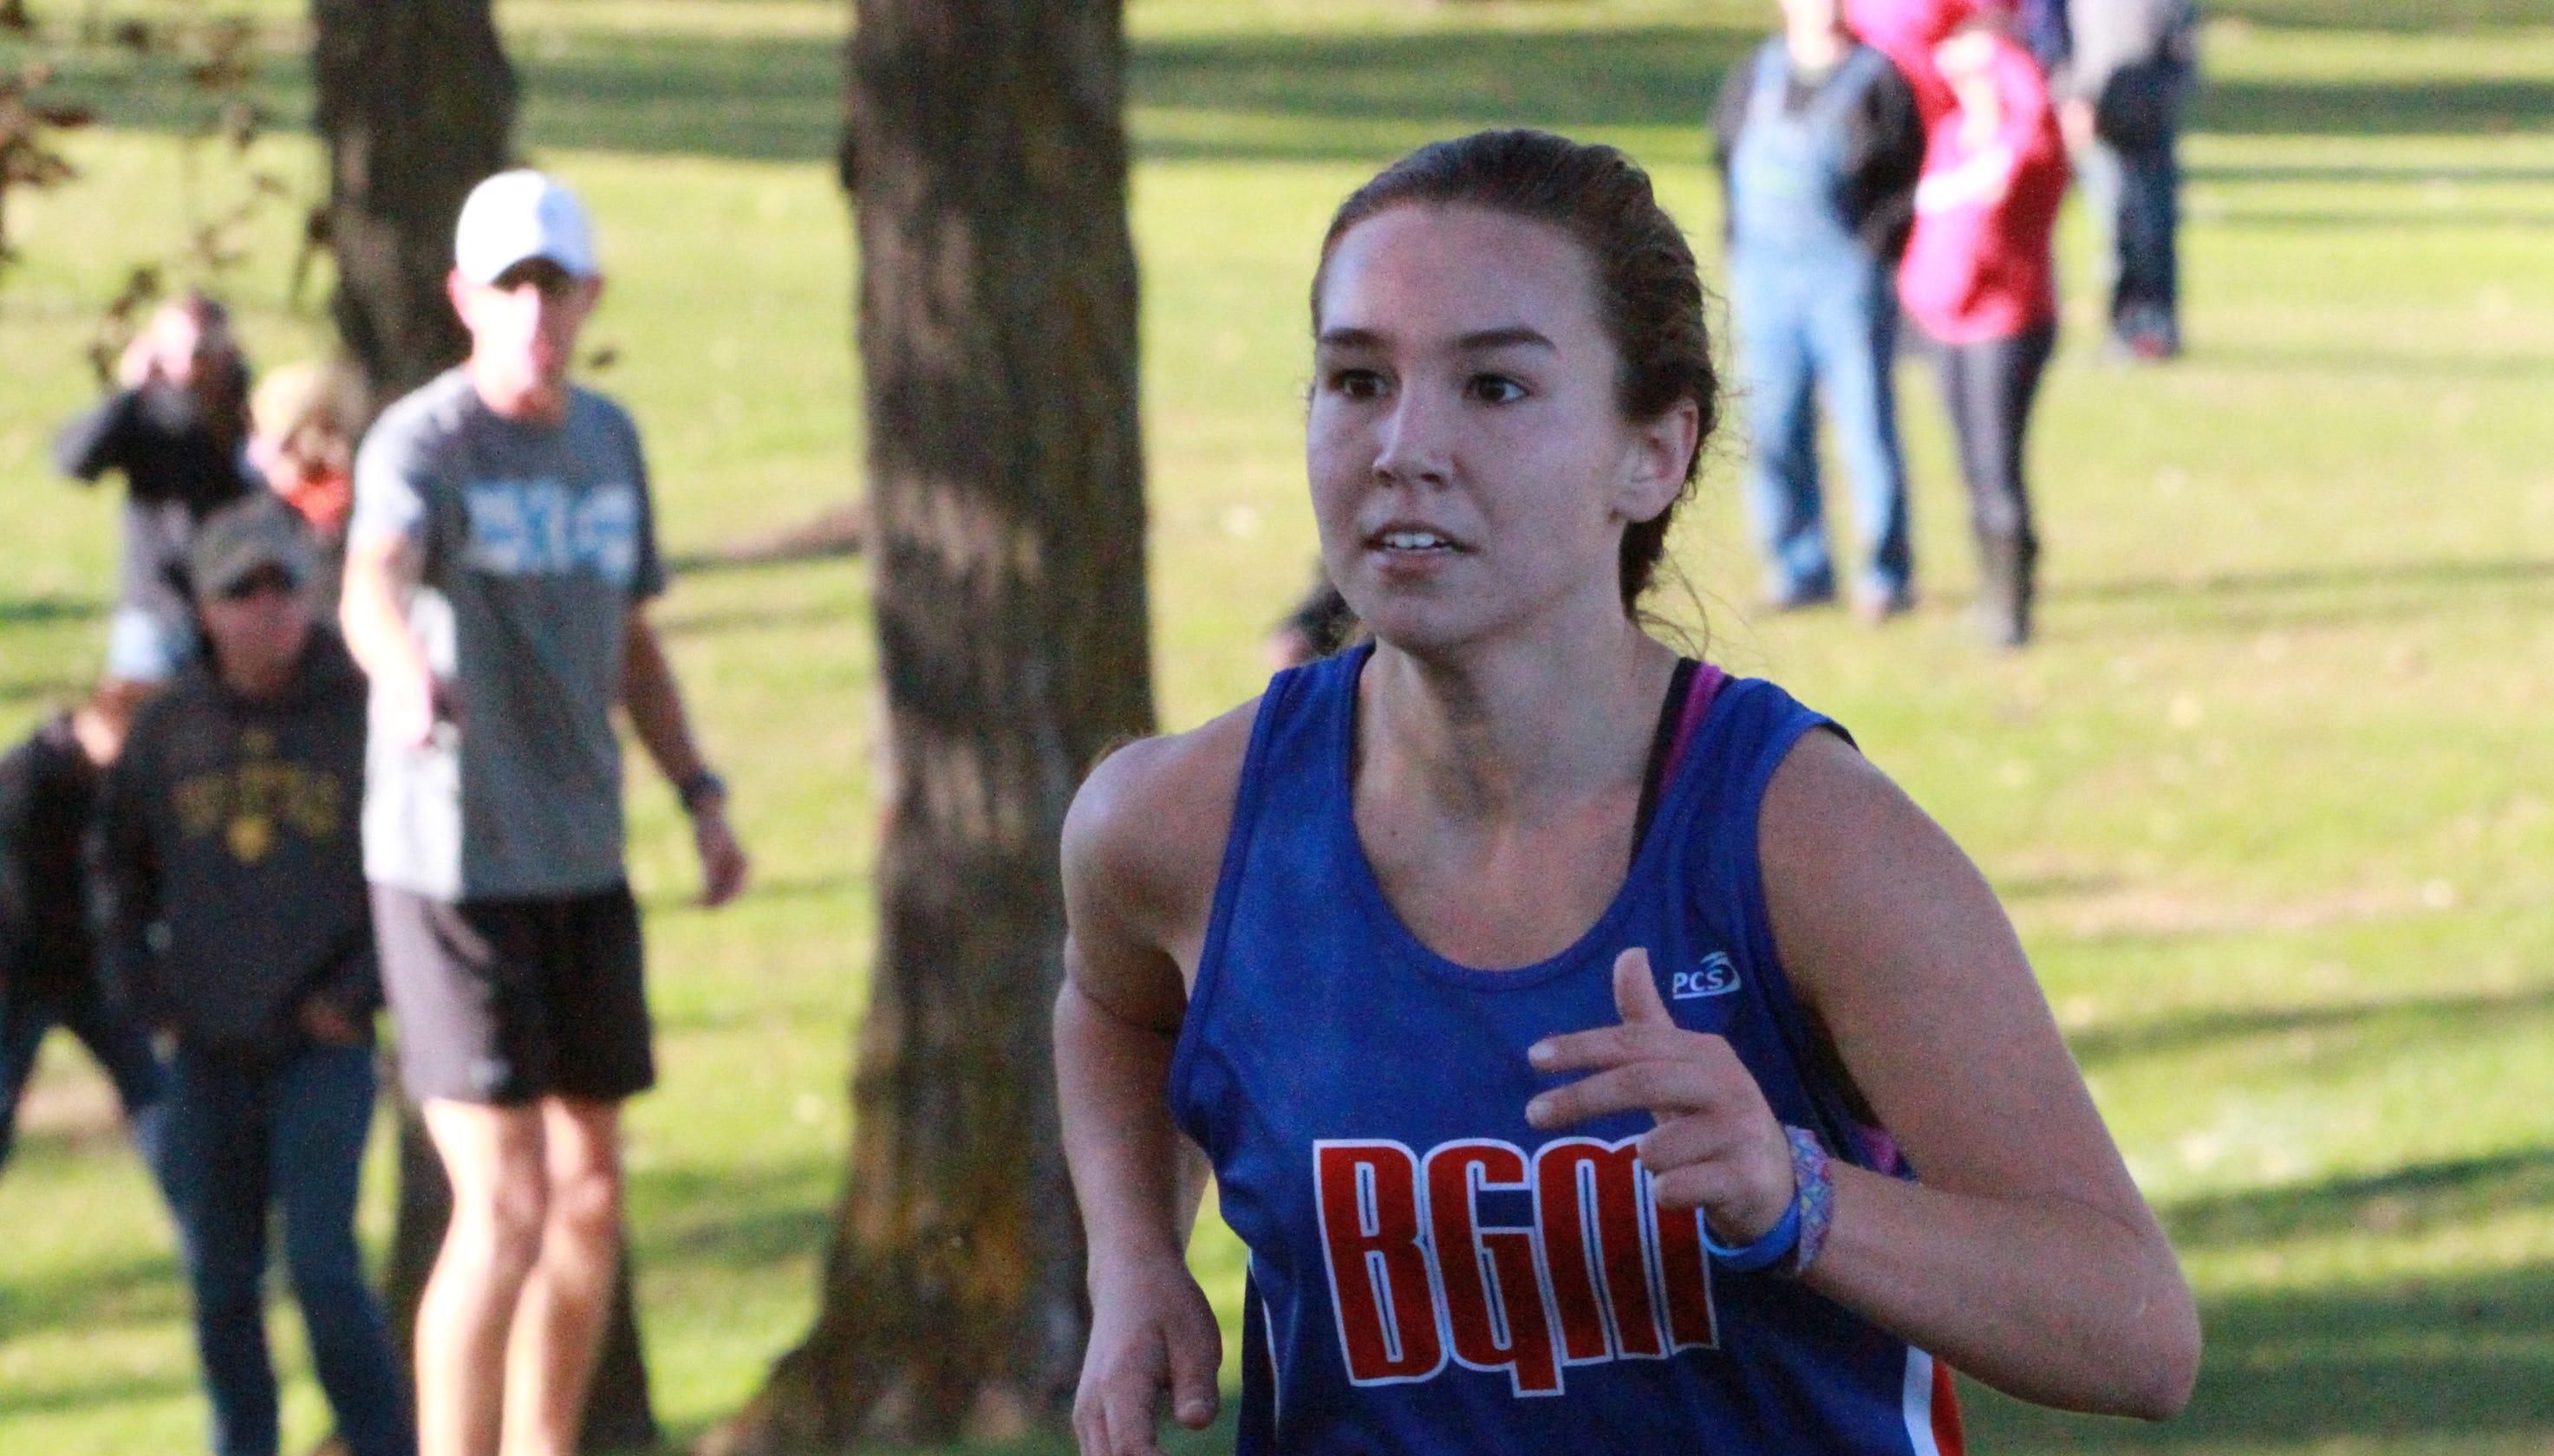 Mollie Tibbetts: Female runners dedicate #MilesforMollie